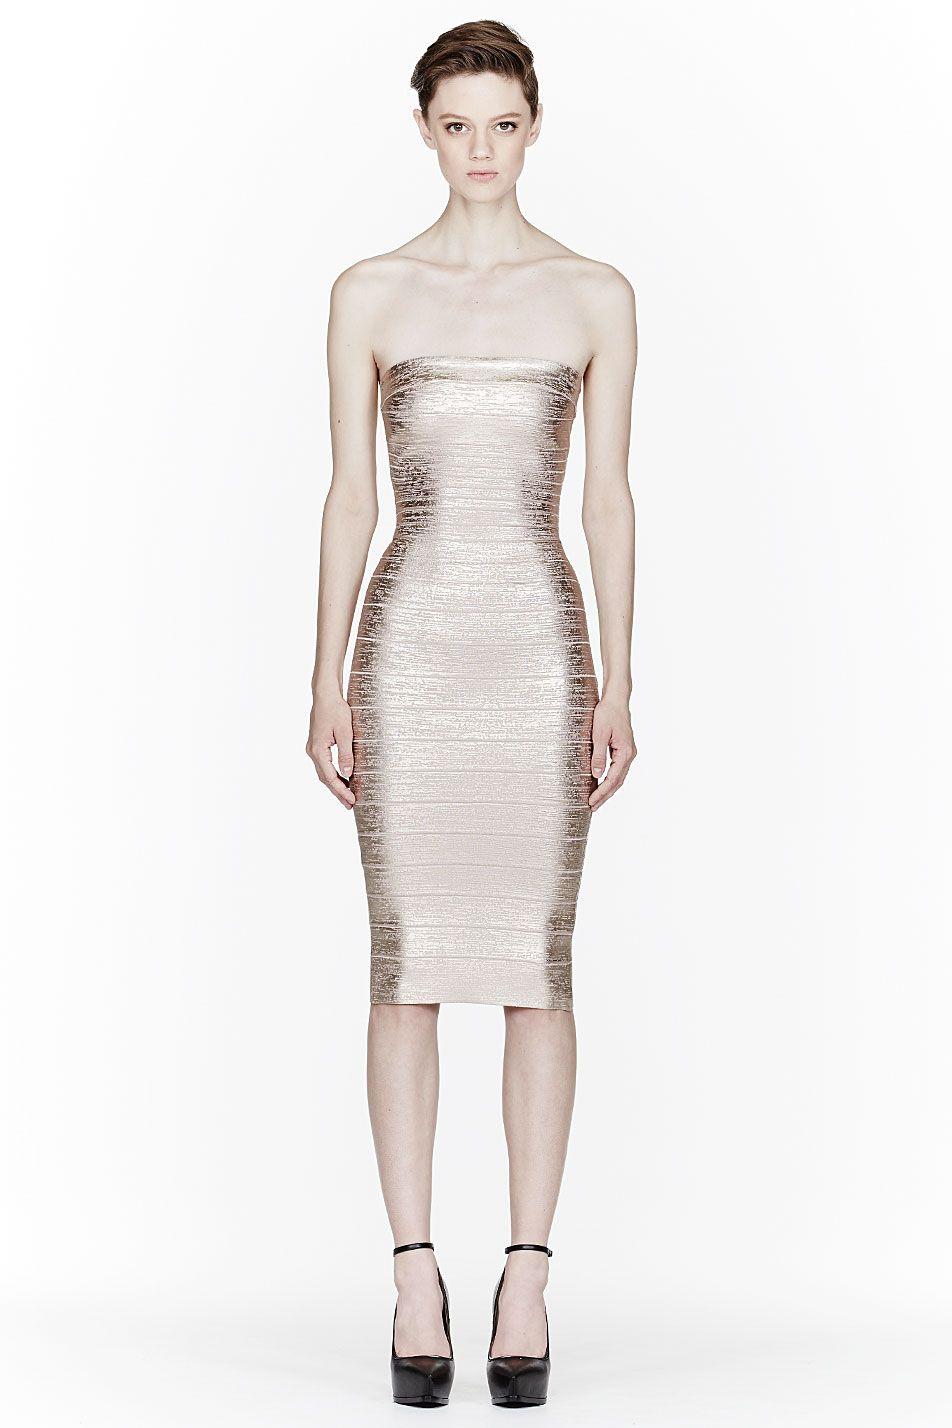 Herve leger rose gold metallic strapless sheath bandage dress my